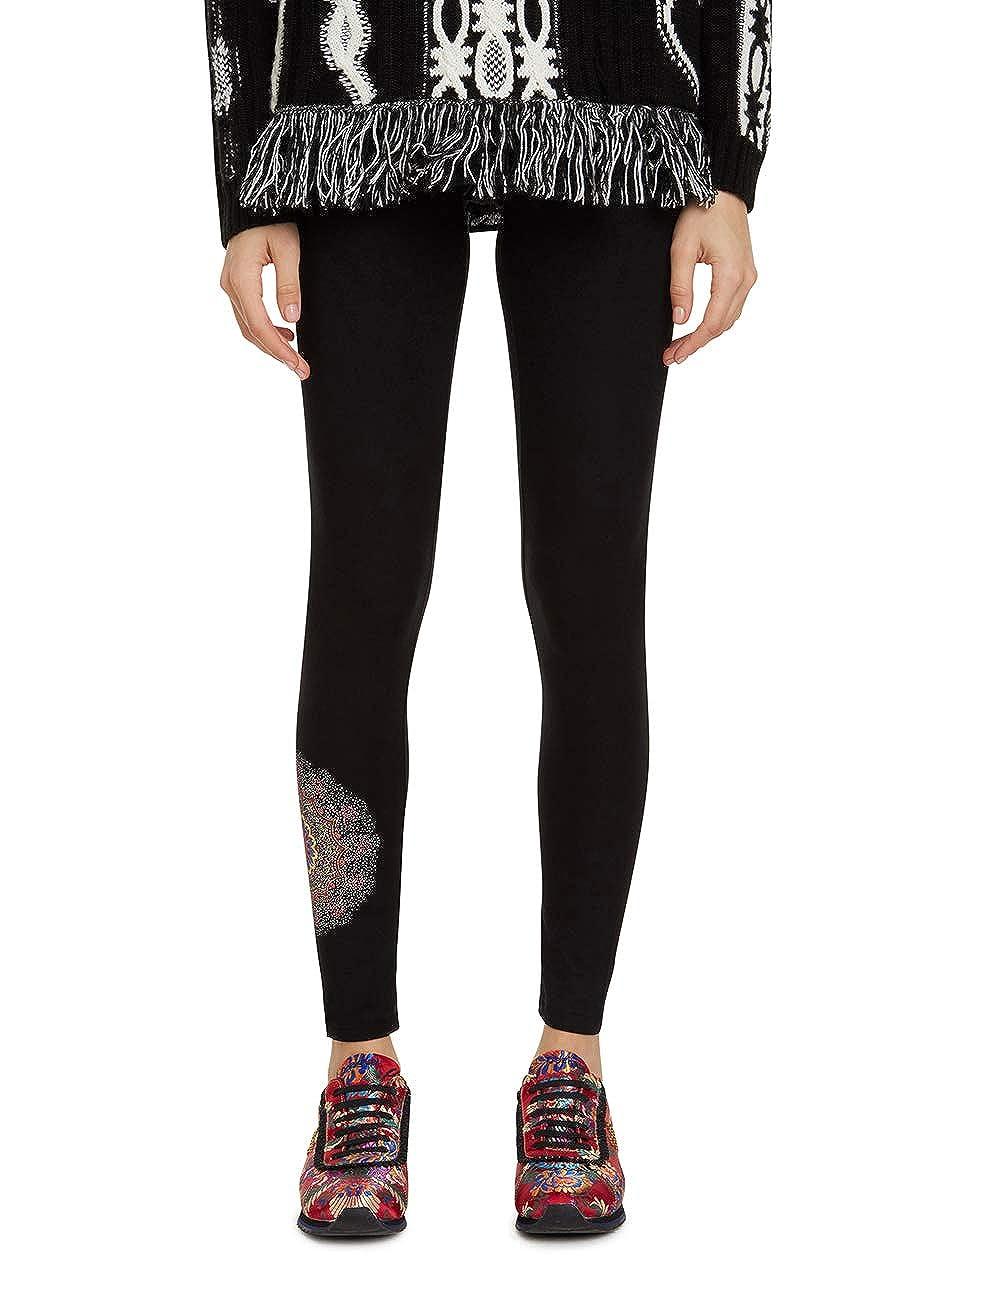 Desigual Hosiery Alexandra Legging Femme